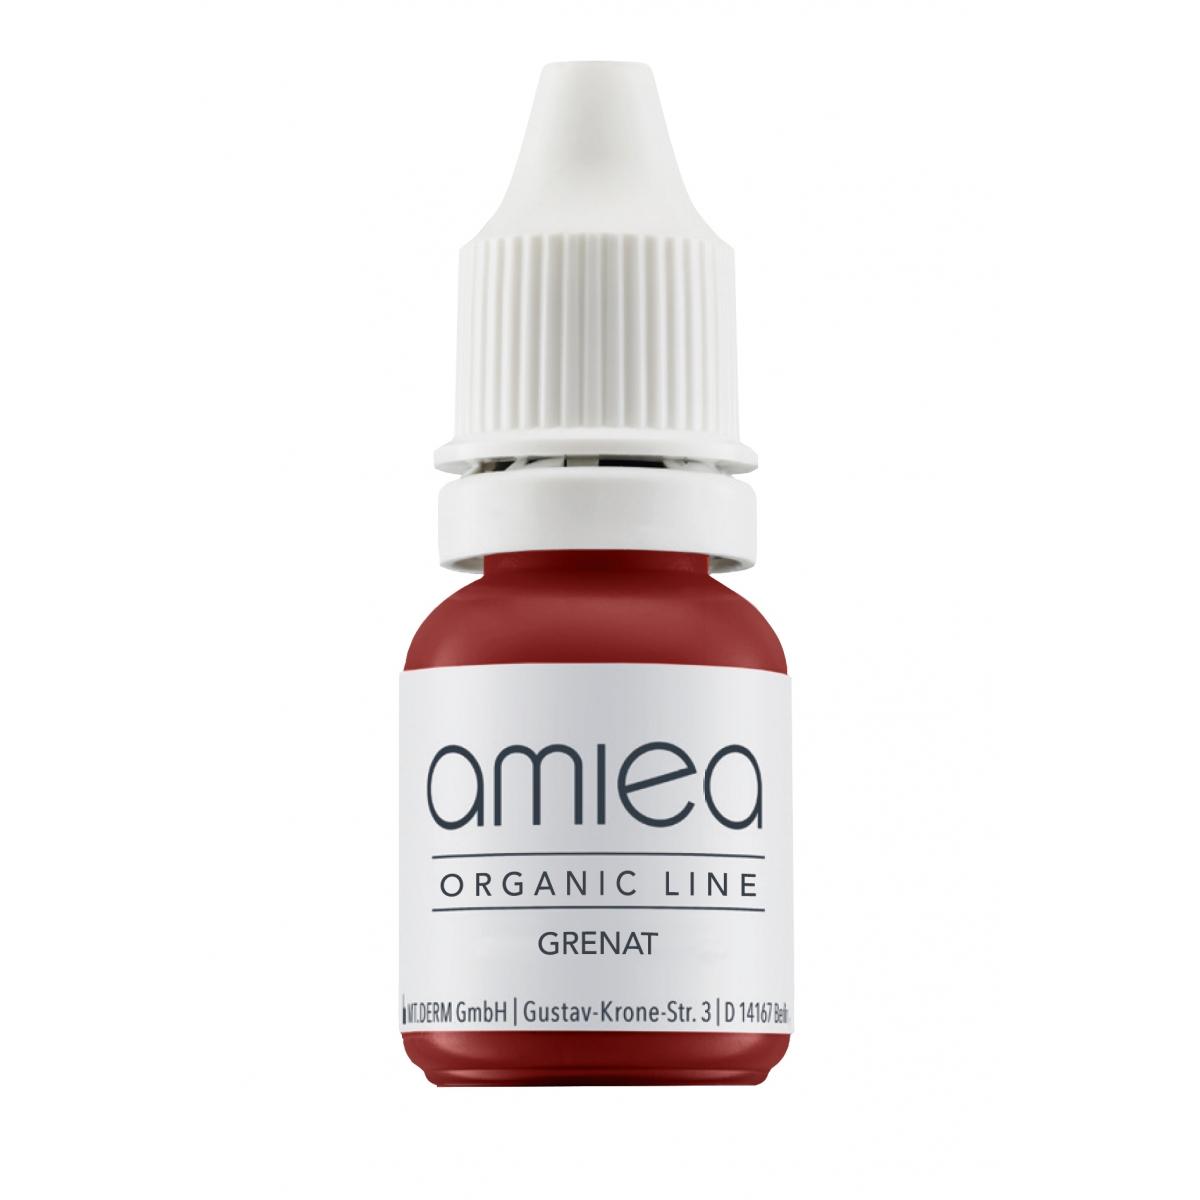 ORGANIC LINE (10ml) - PIGMENT GRENAT ORGANICLINE AMIEA (10 ml)